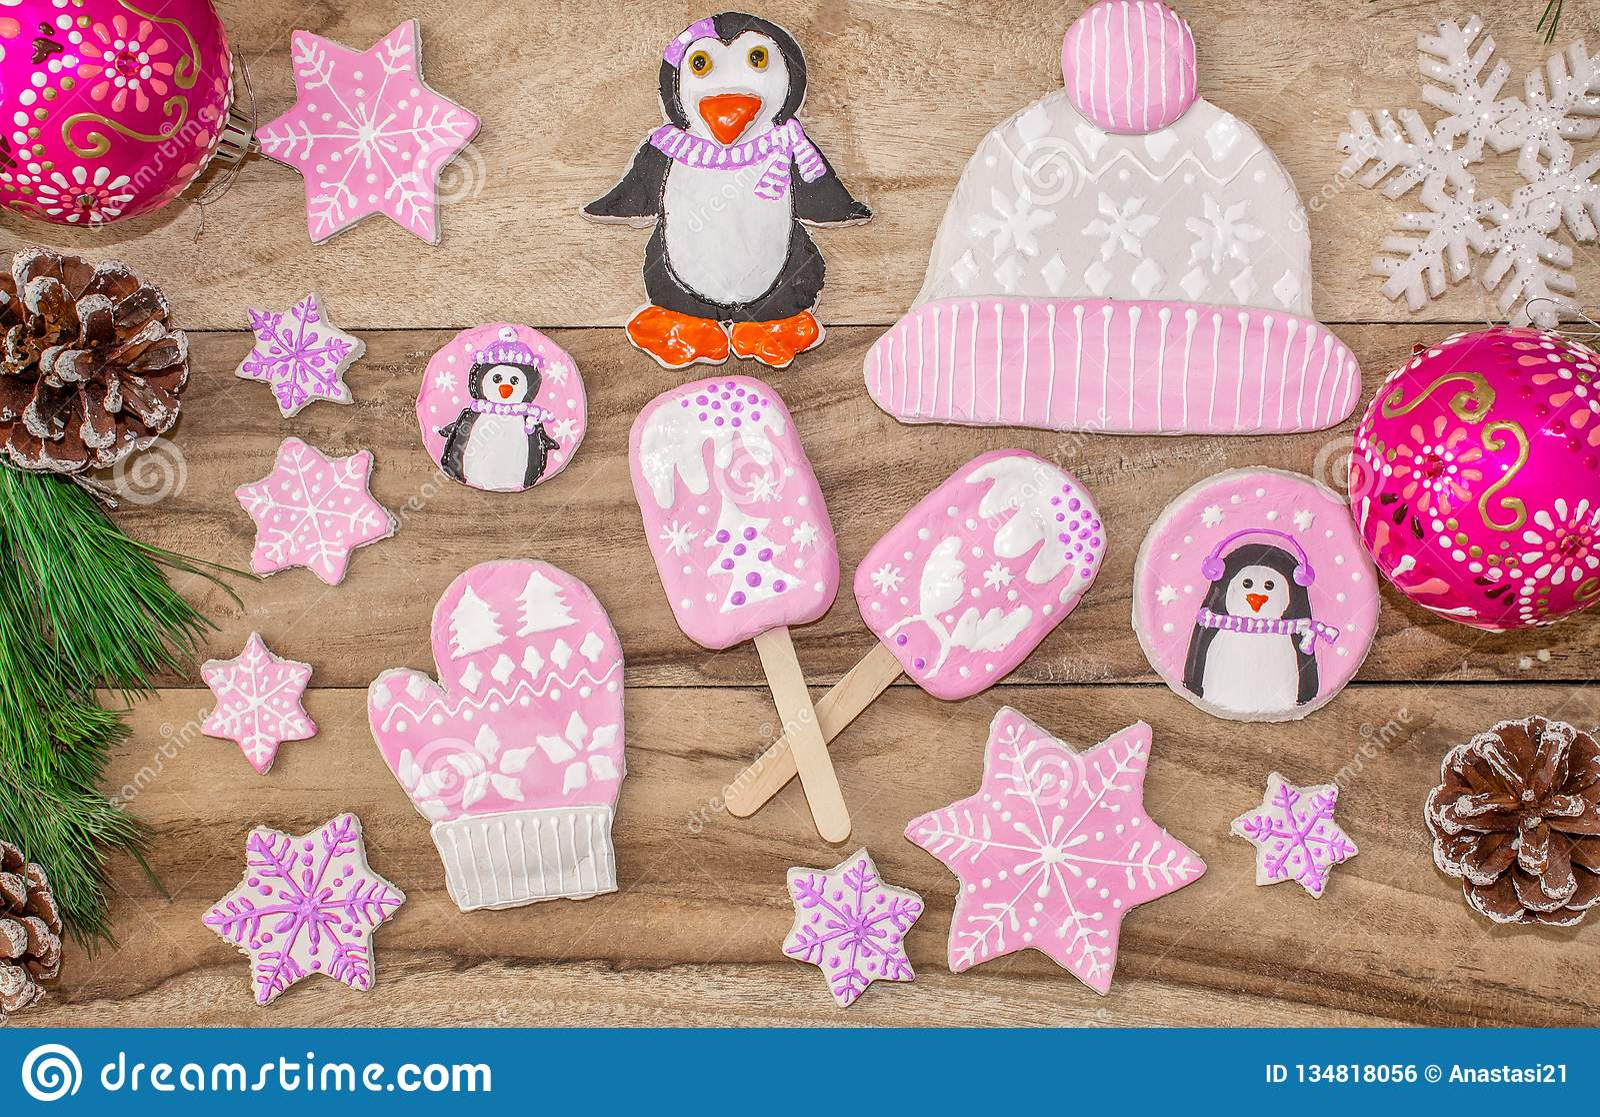 R Μελόψωμο, penguins, γάντια και καπέλα με τους αστερίσκους, παγωτό, σε ένα ξύλινο υπόβαθρο